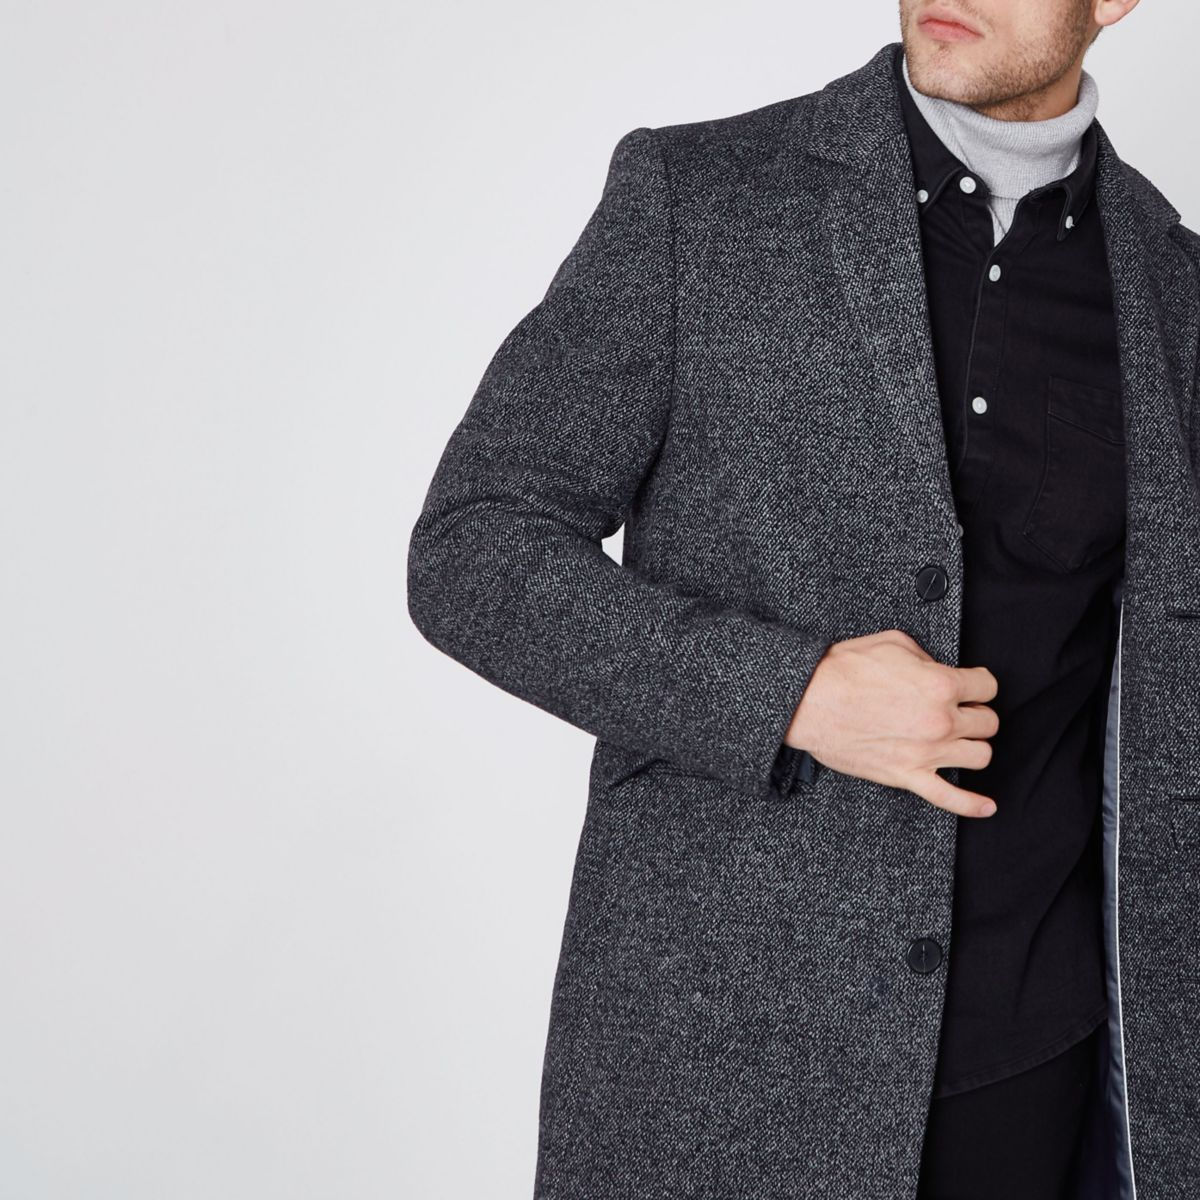 Overcoat sale